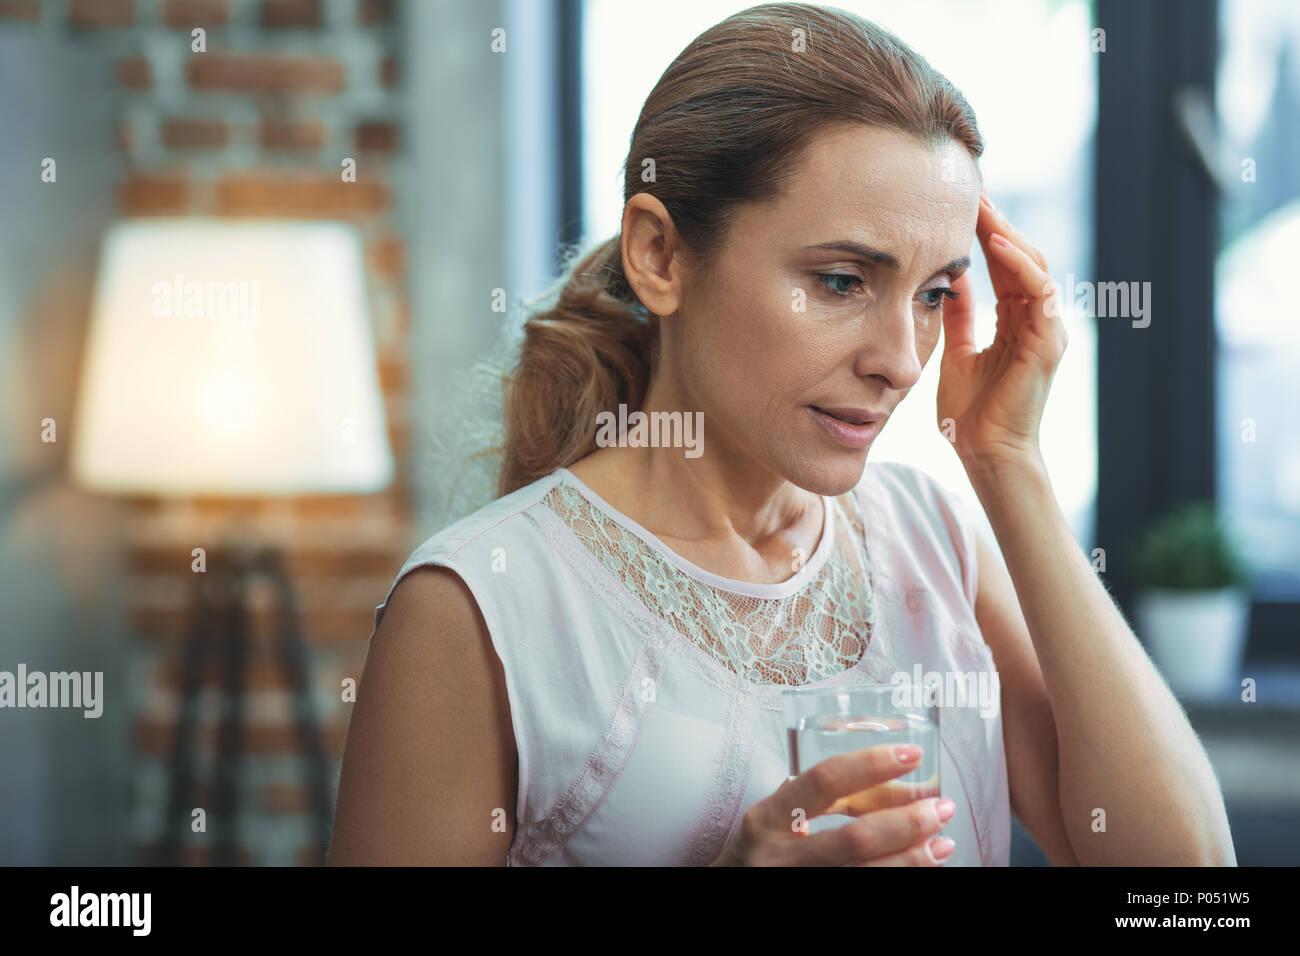 Calm mature woman feeling discomfort - Stock Image